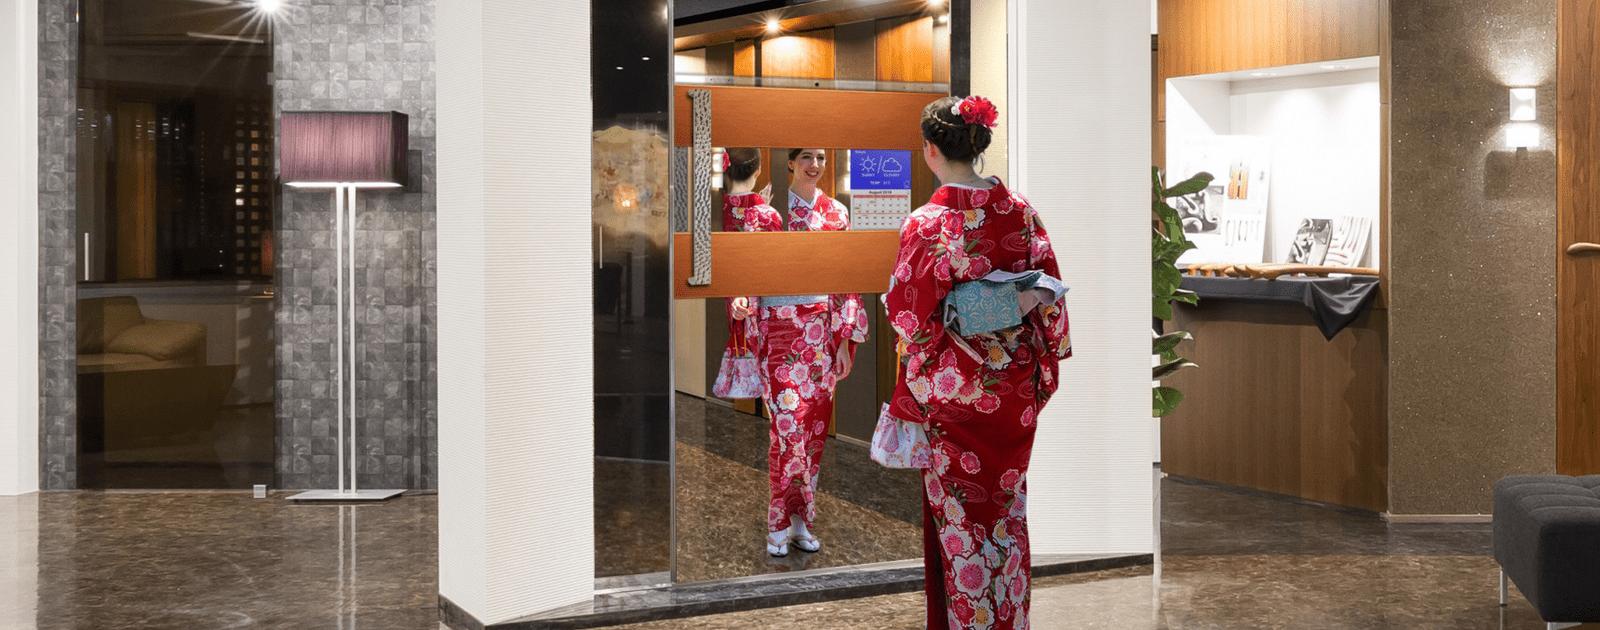 Japan Display Inc Shows off Futuristic Technology